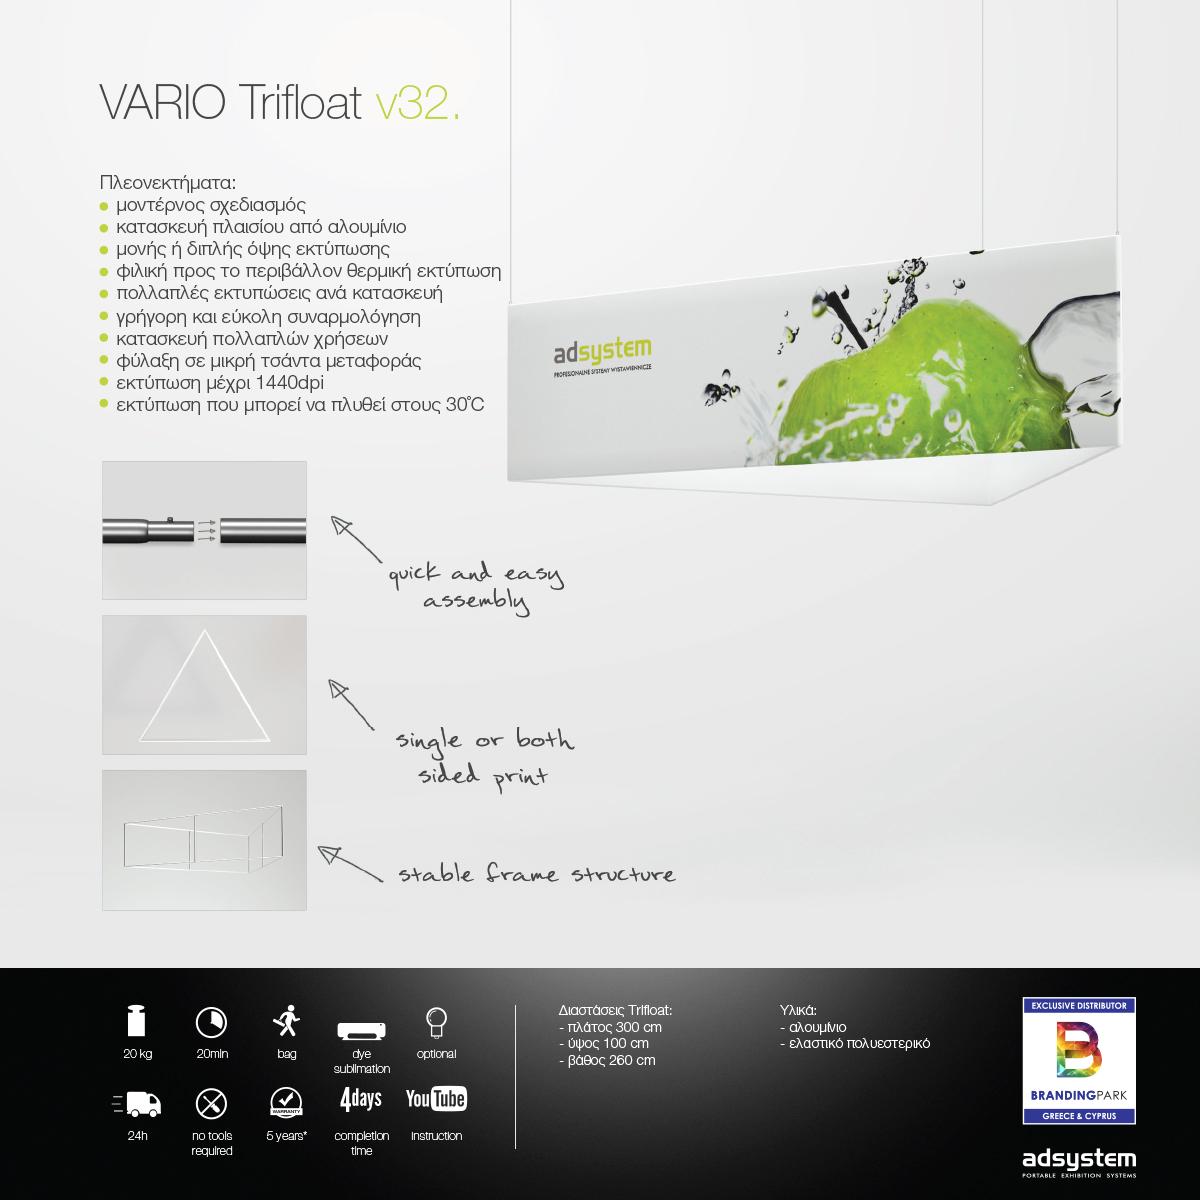 v32-Trifloat.jpg